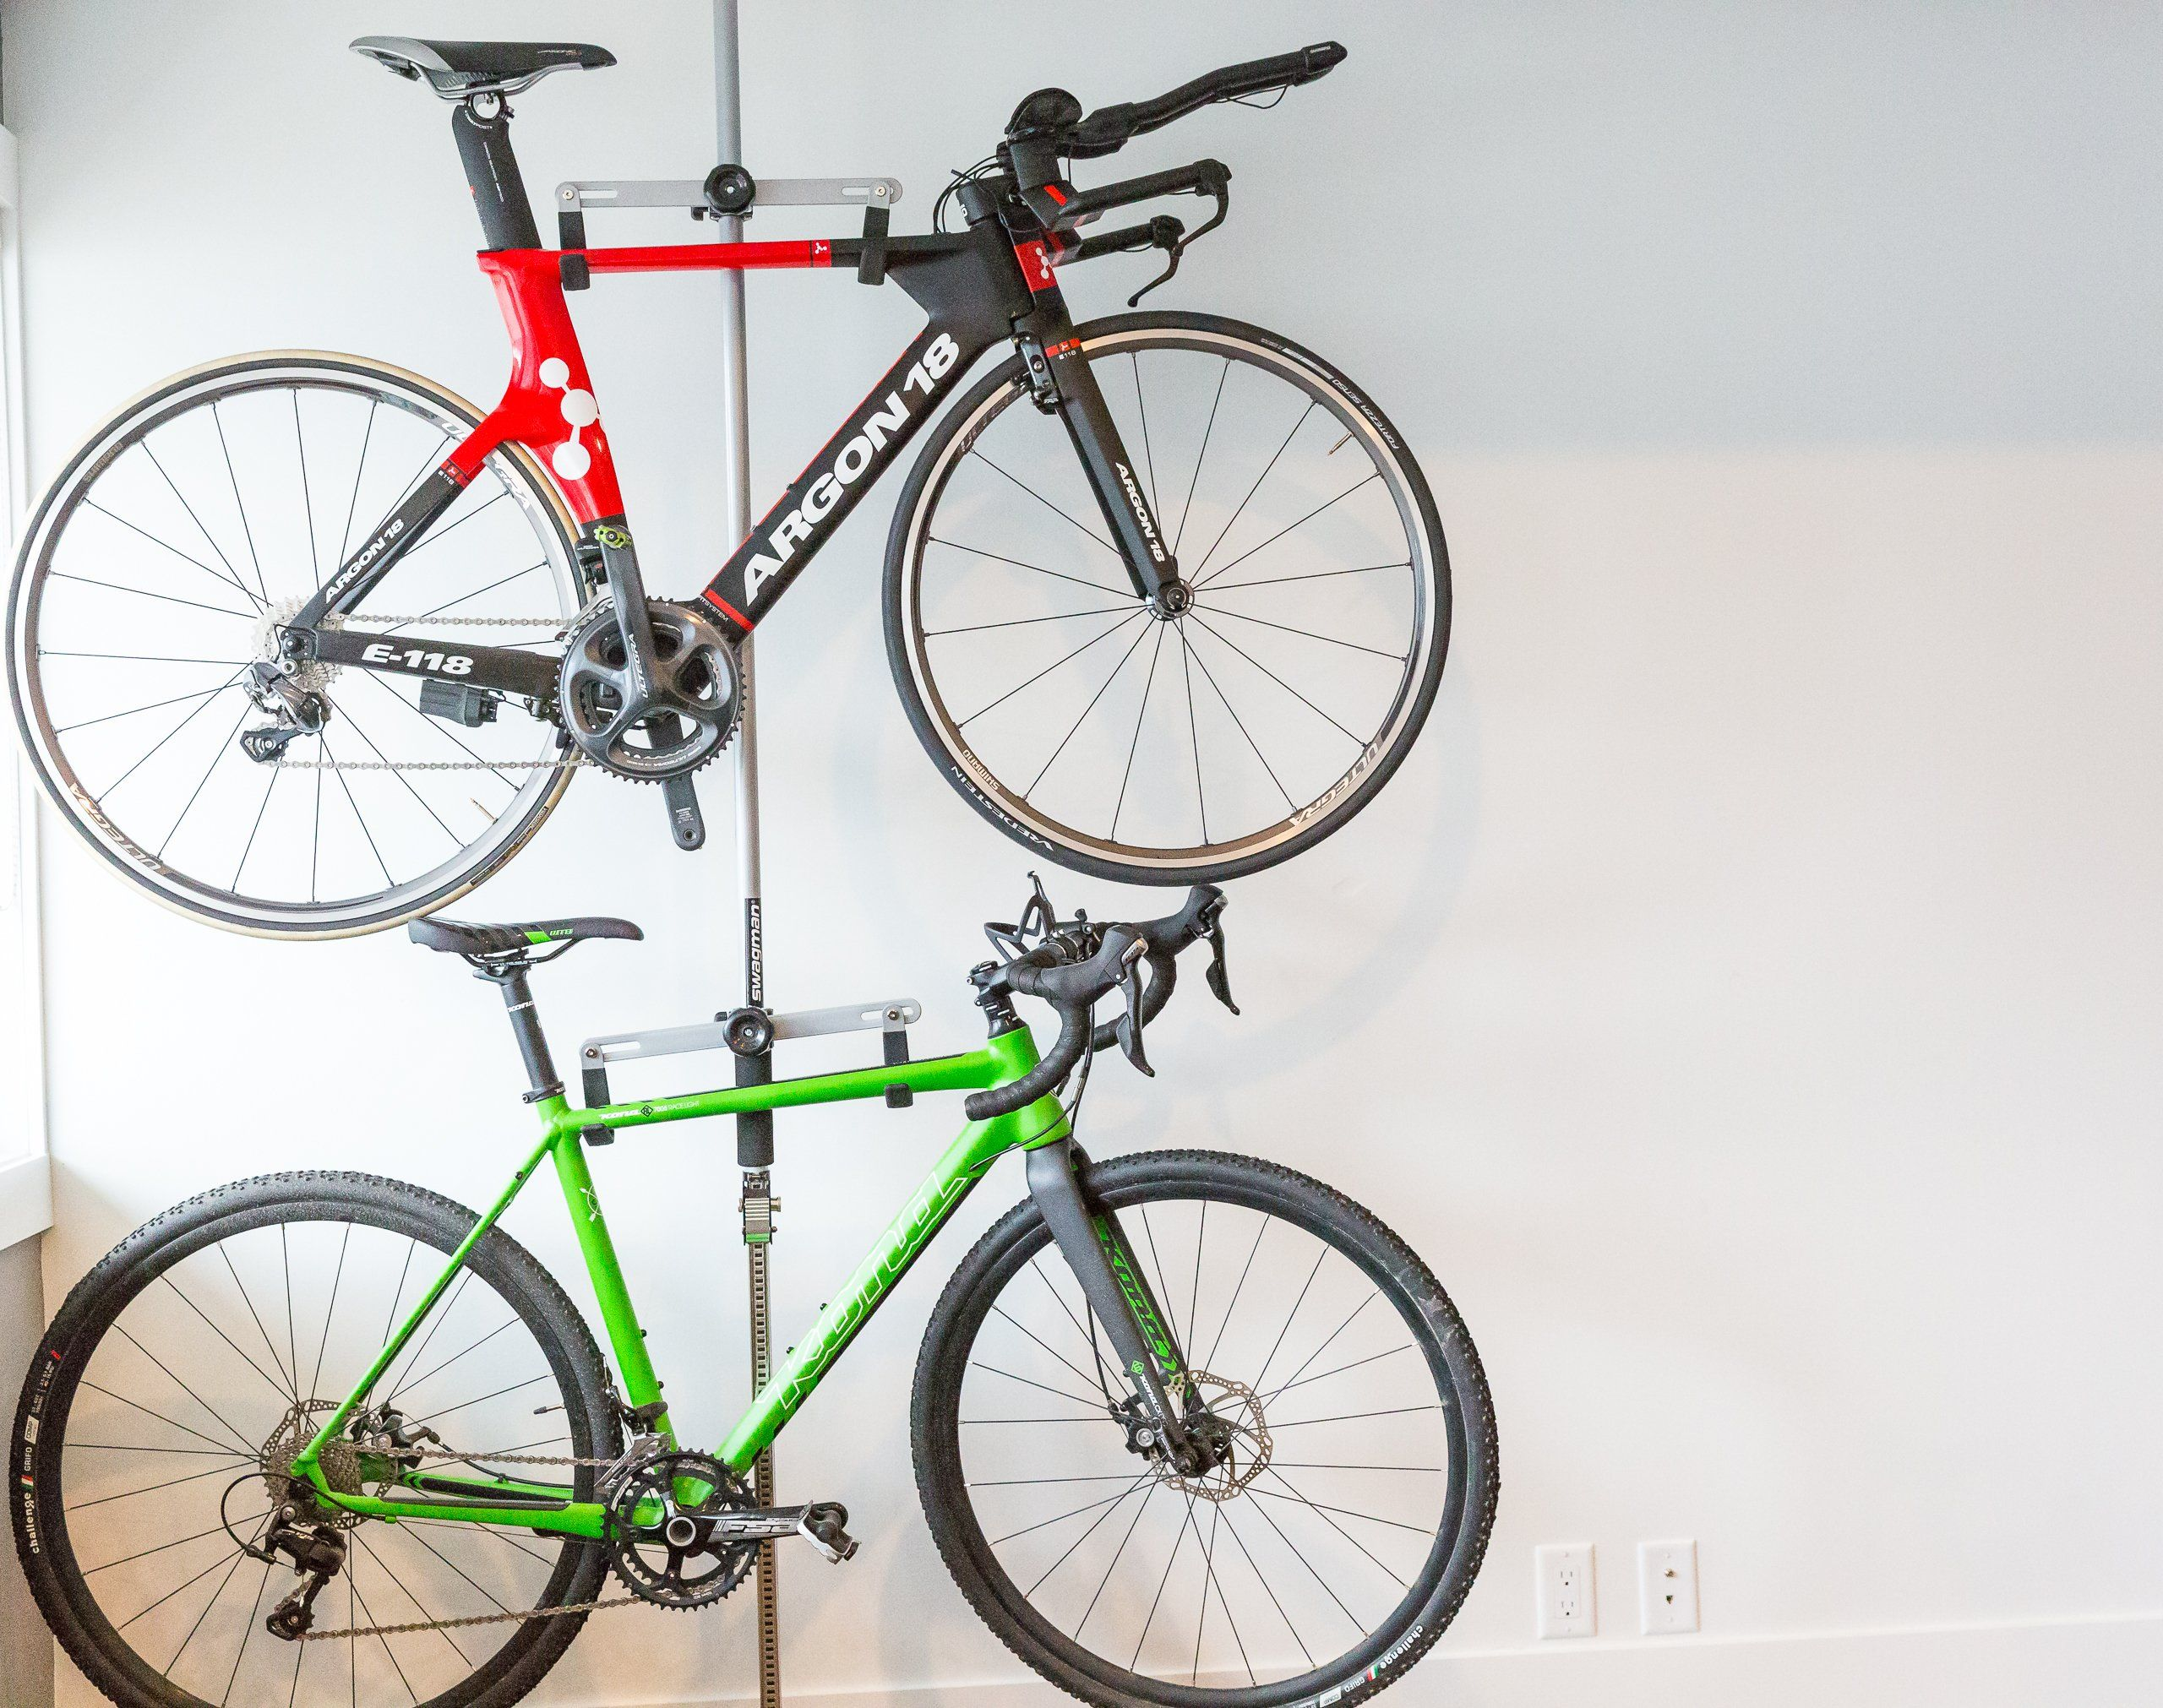 Swagman Hang It Bike Hanger Click Image To Review More Details